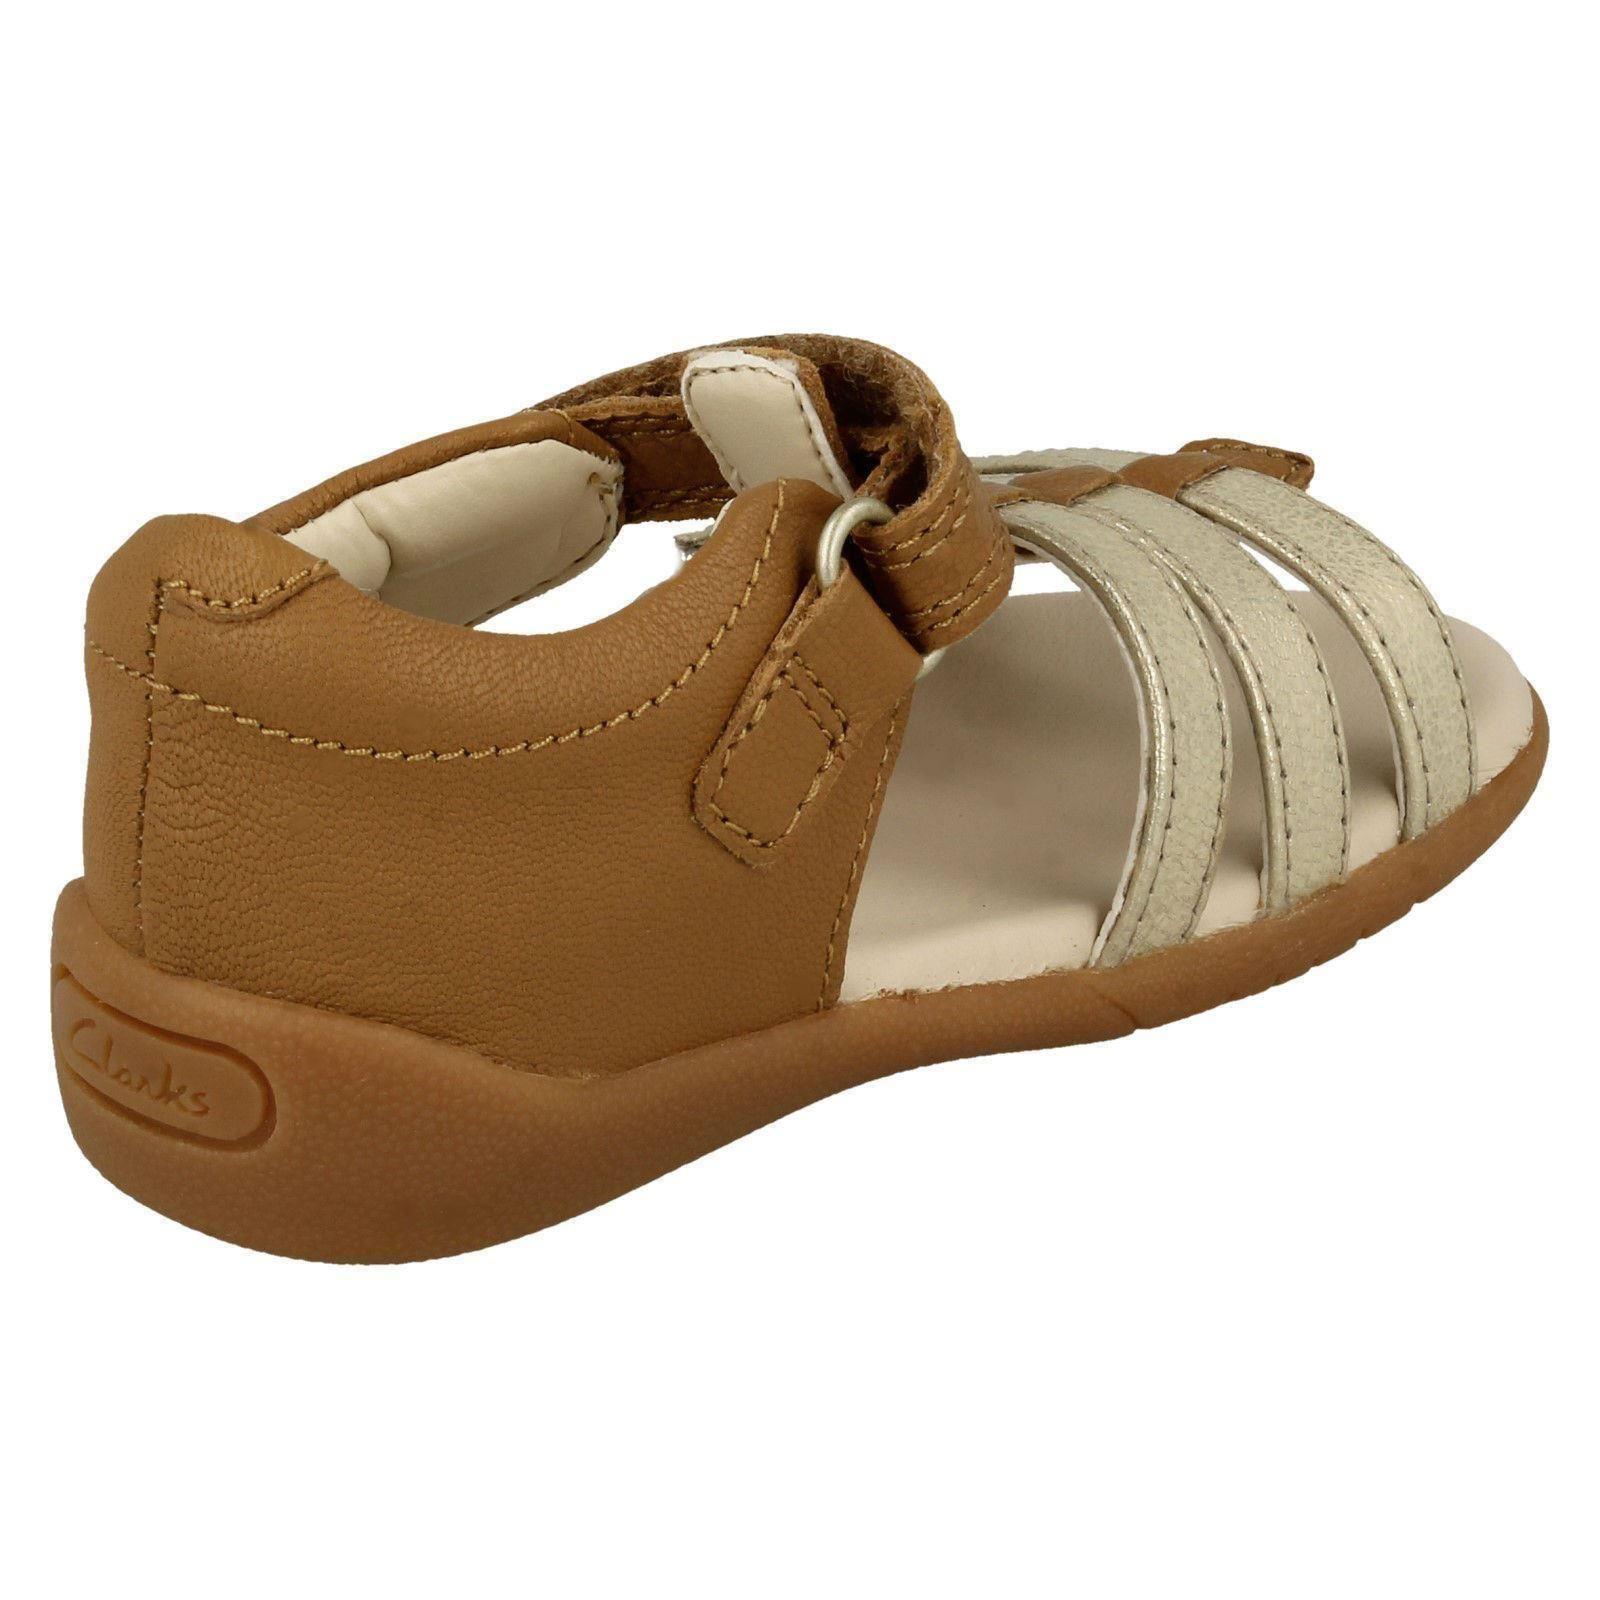 Girls Clarks Stylish Open Toe Sandals Zora Spark T